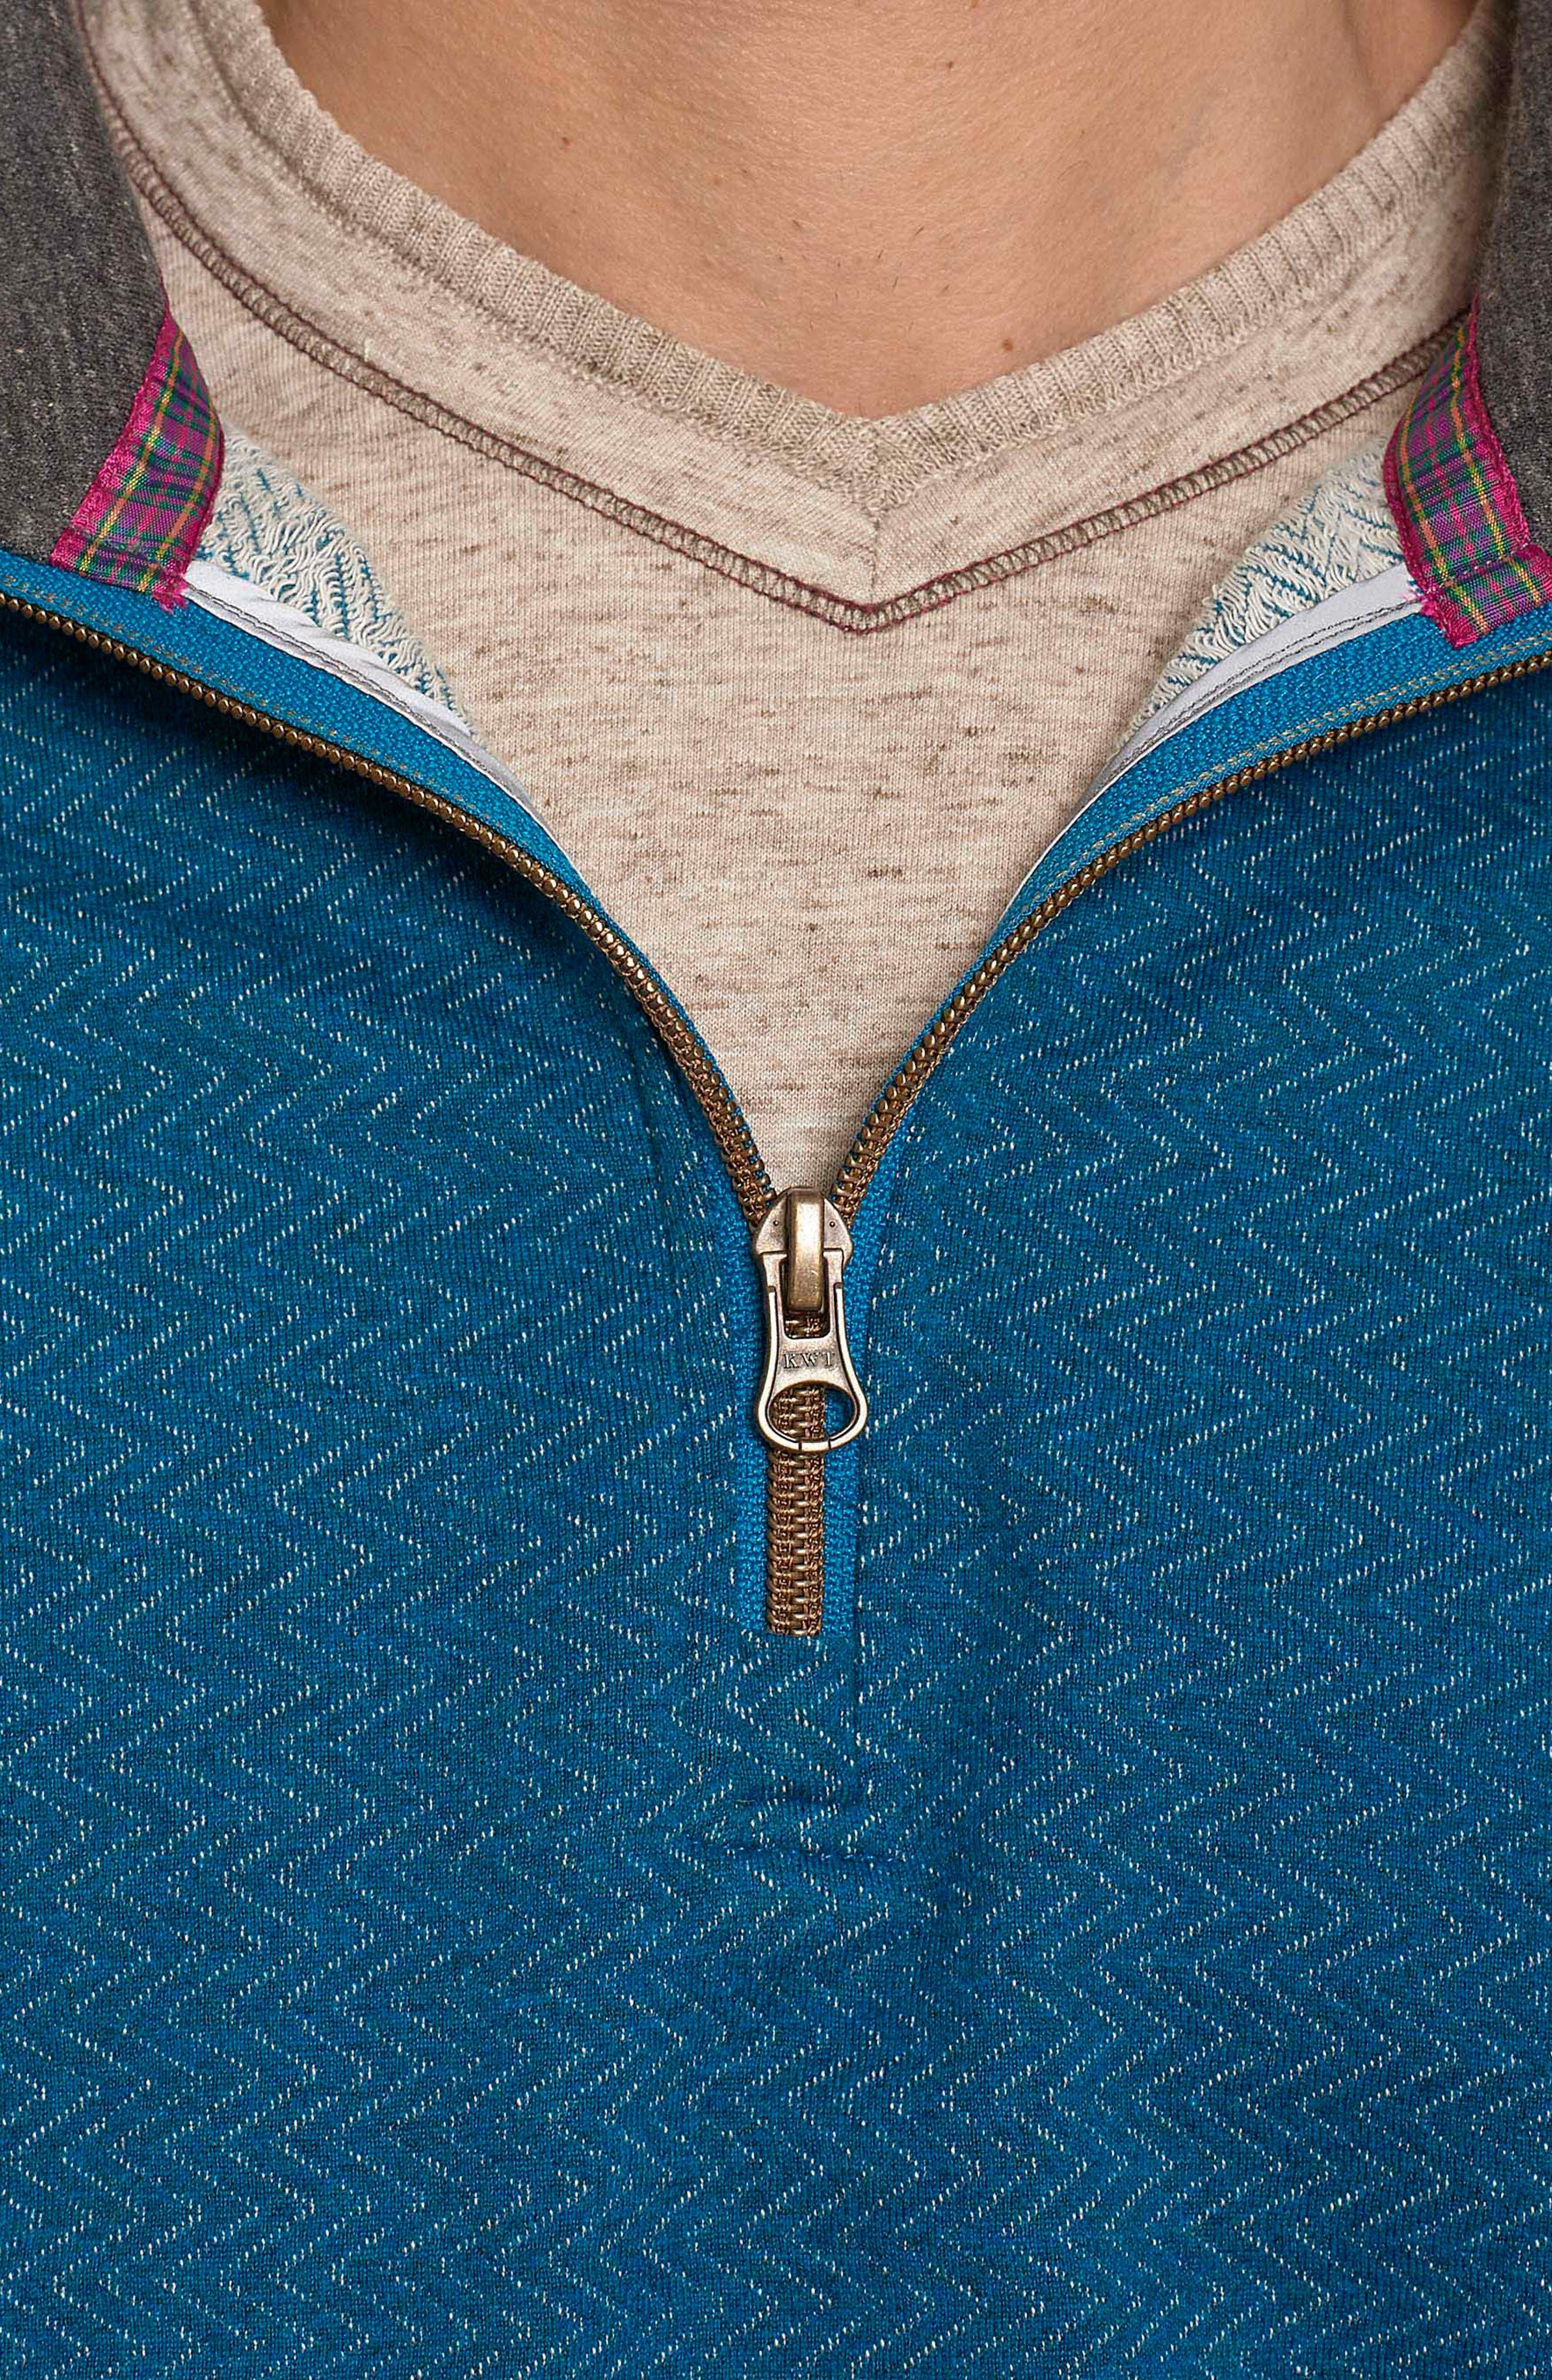 Warrensburg Herringbone Quarter Zip Pullover,                             Alternate thumbnail 3, color,                             Heather Teal